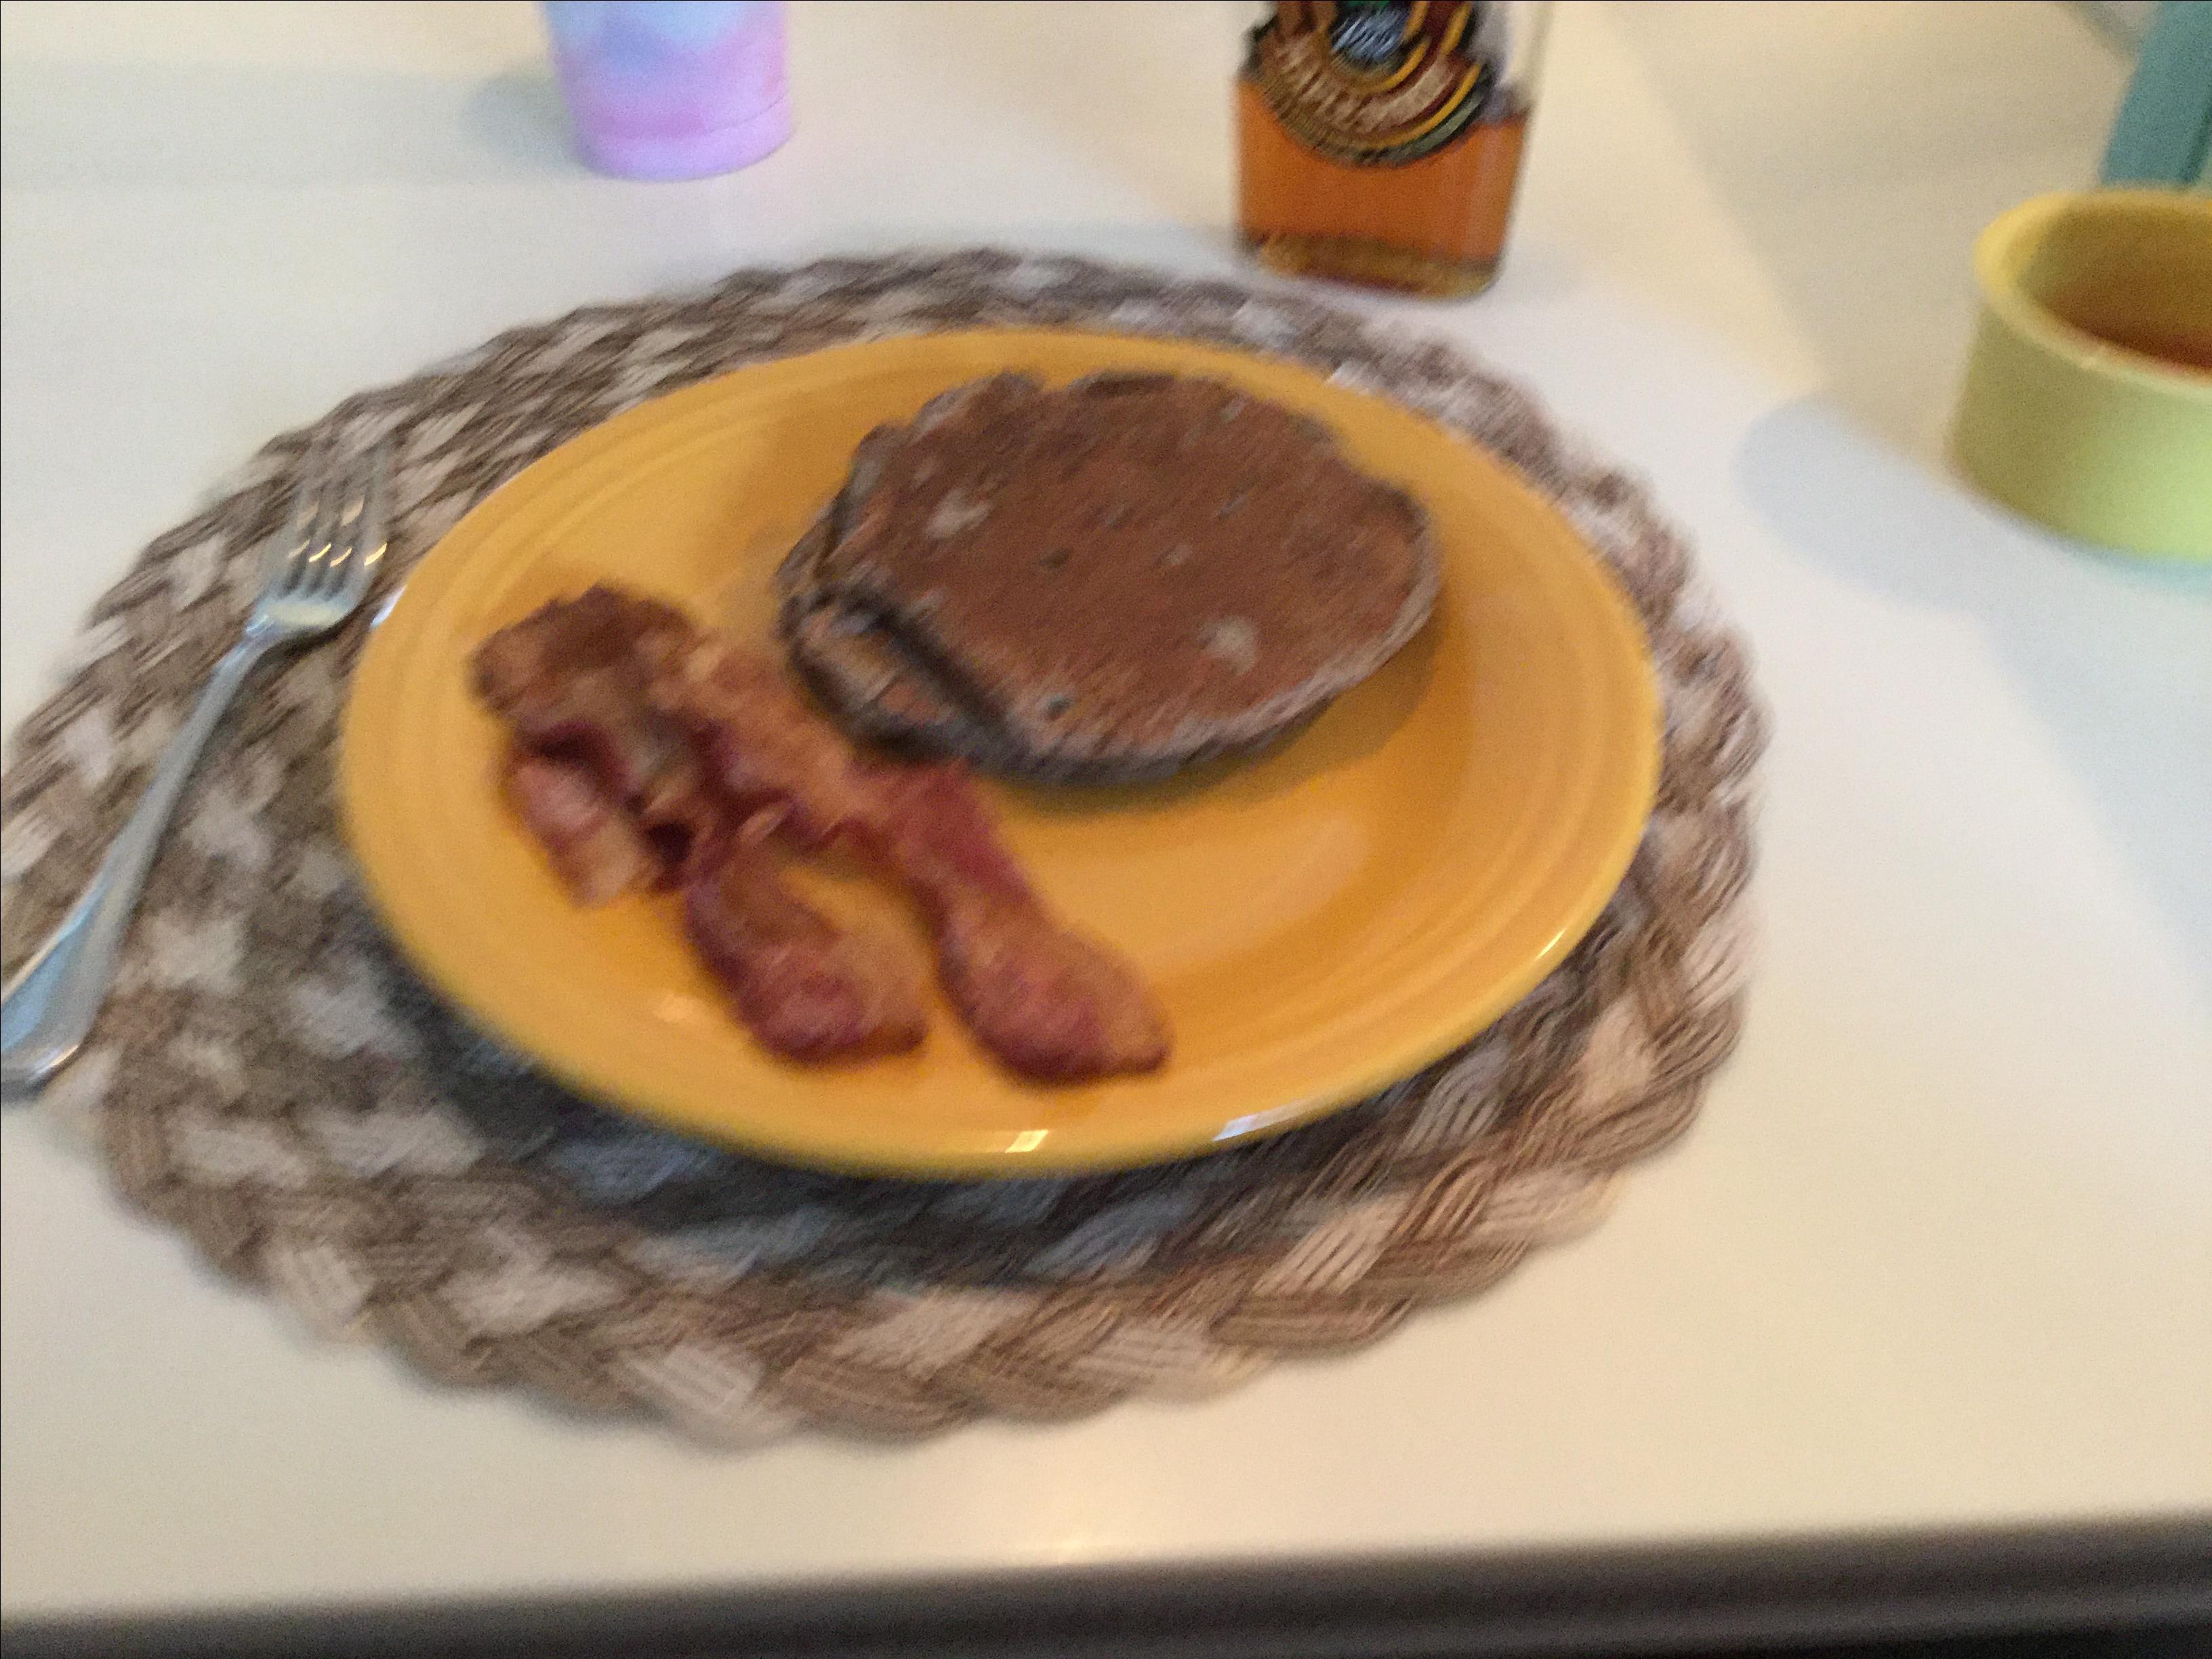 Old-Fashioned Sour Buckwheat Pancakes Charlene Feniello